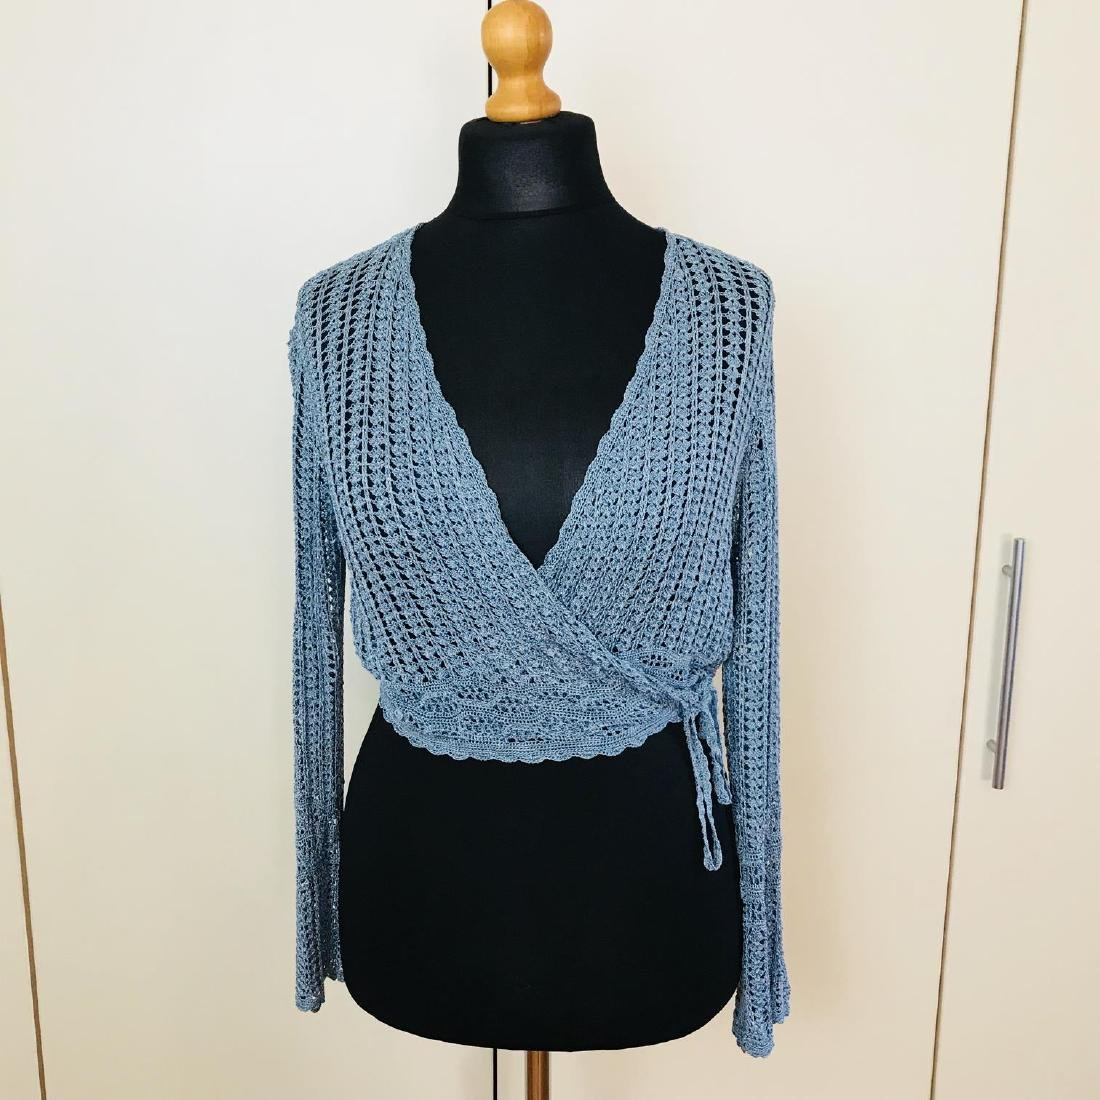 Vintage Women's Designer Sweater Cardigan Top Size US 6